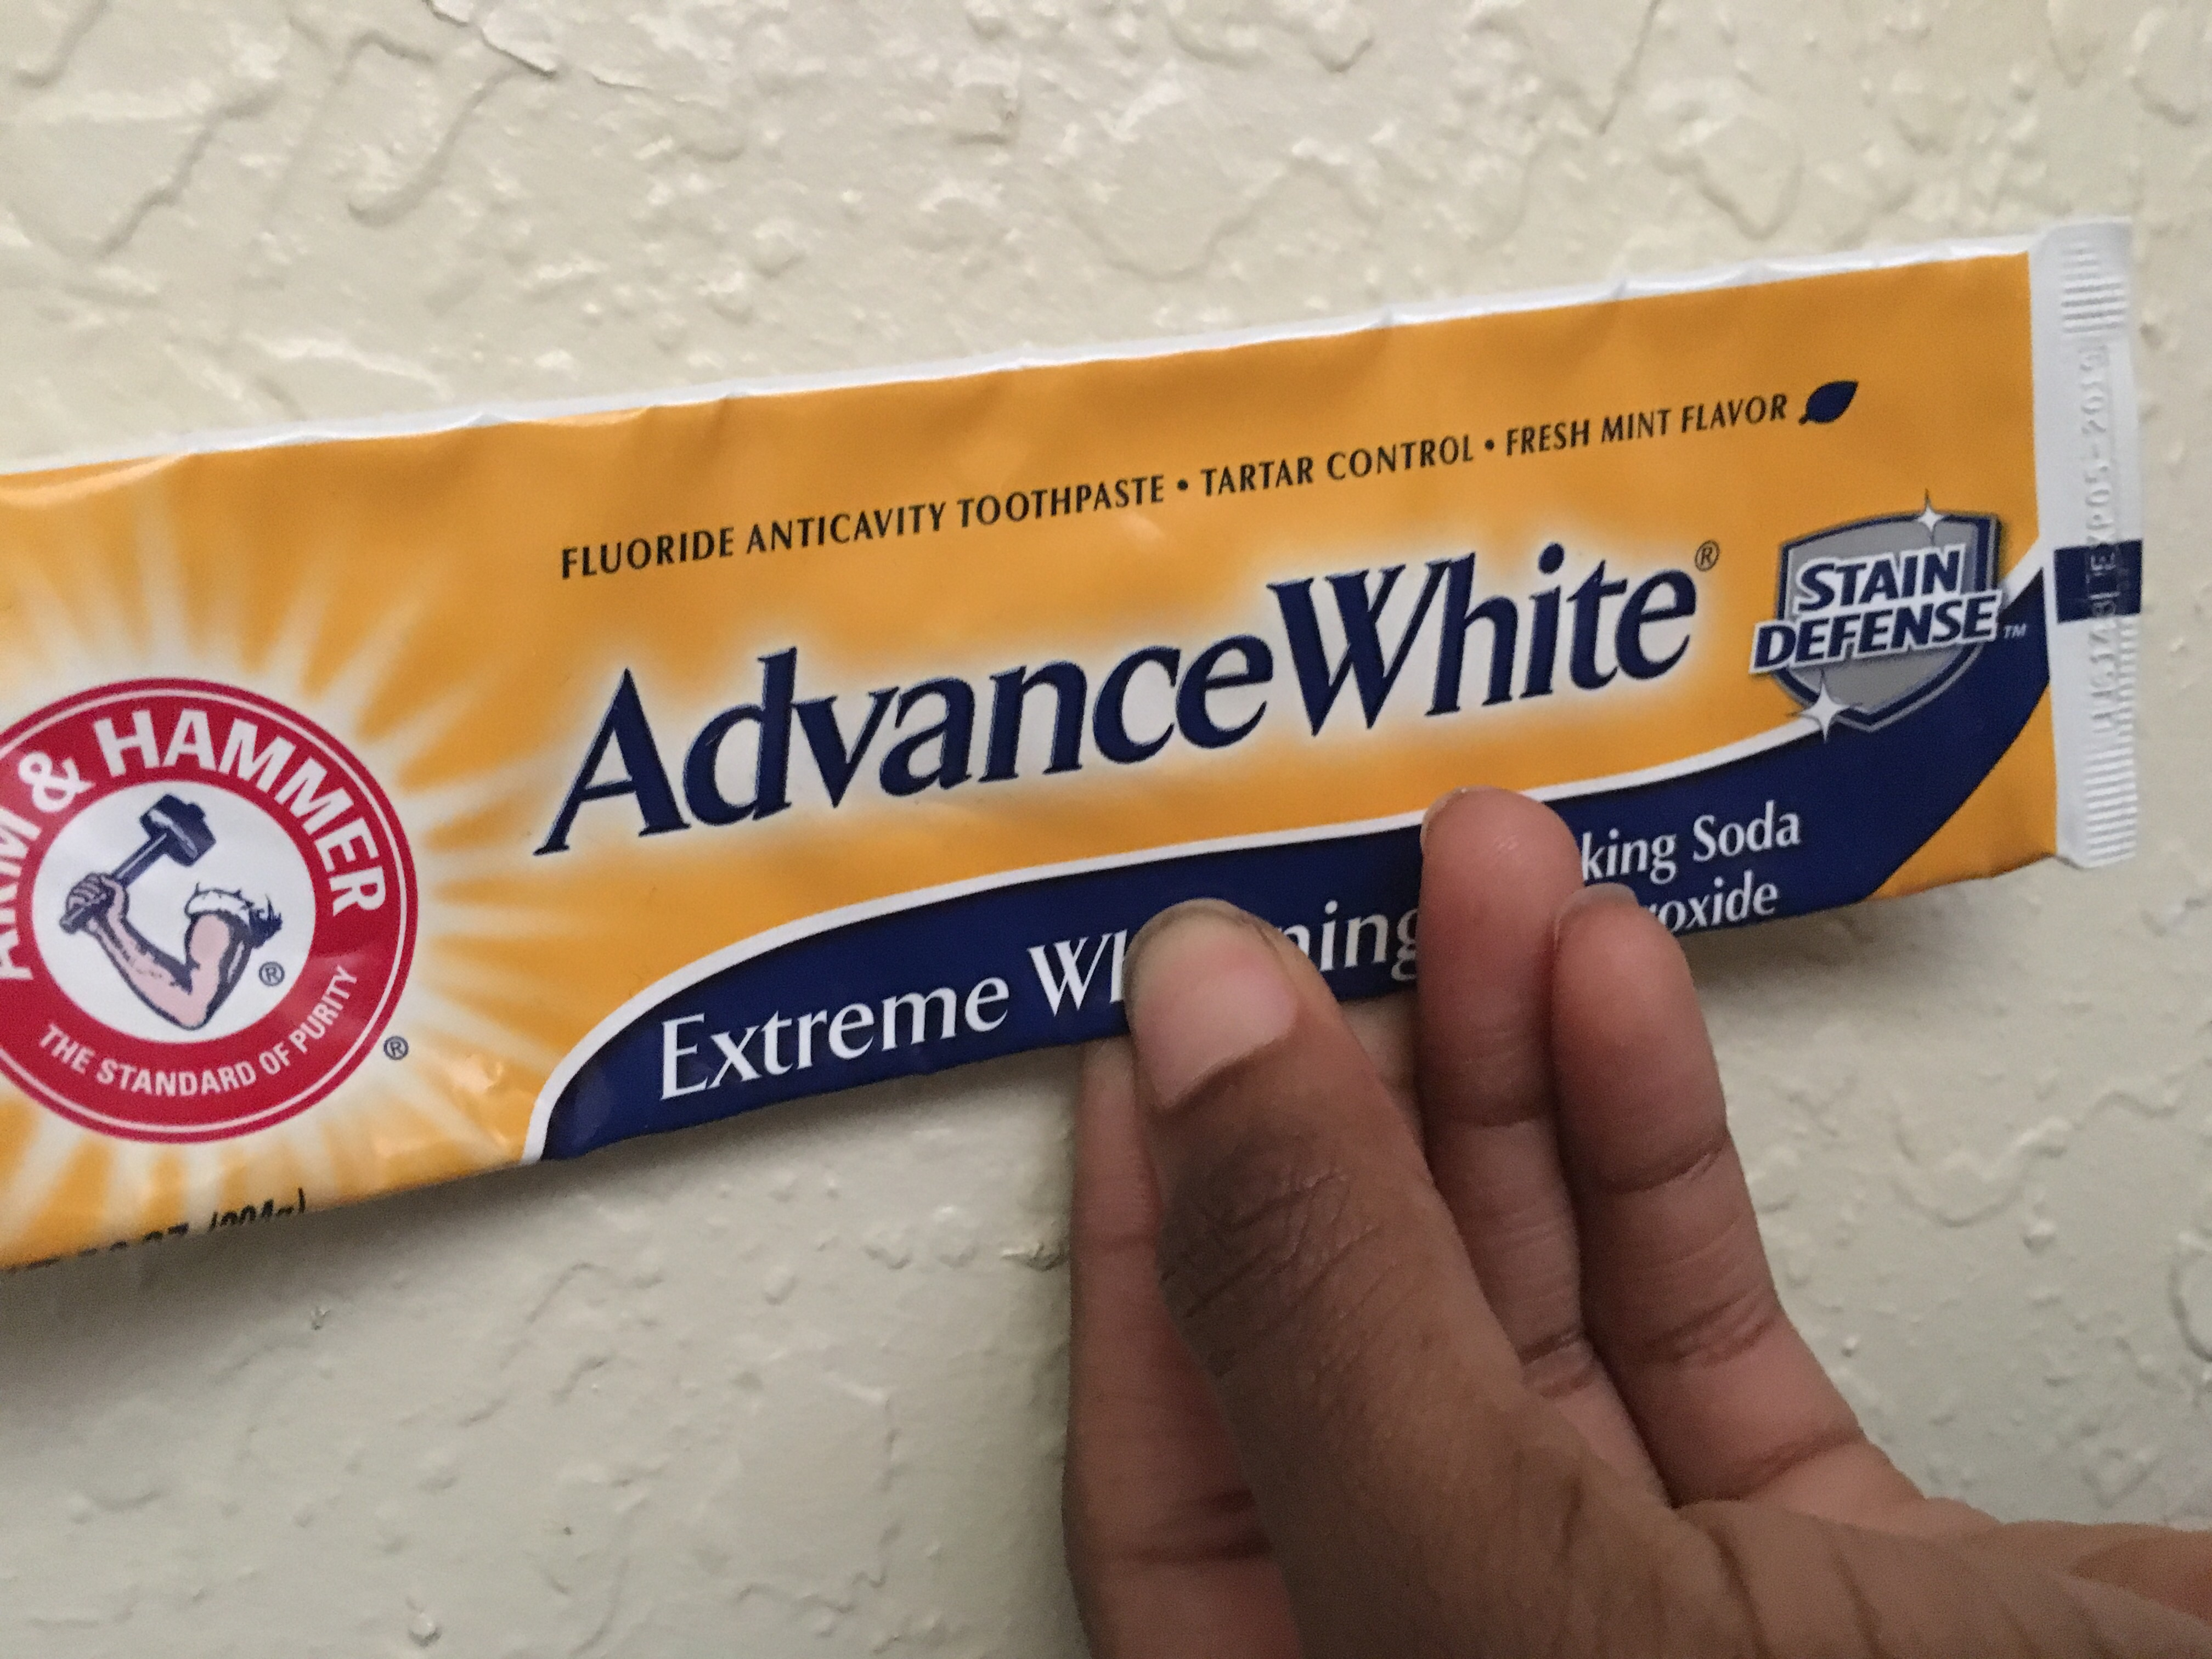 ARM & HAMMER™ Advance White Breath Freshening Baking Soda & Frosted Mint uploaded by Kenya J.